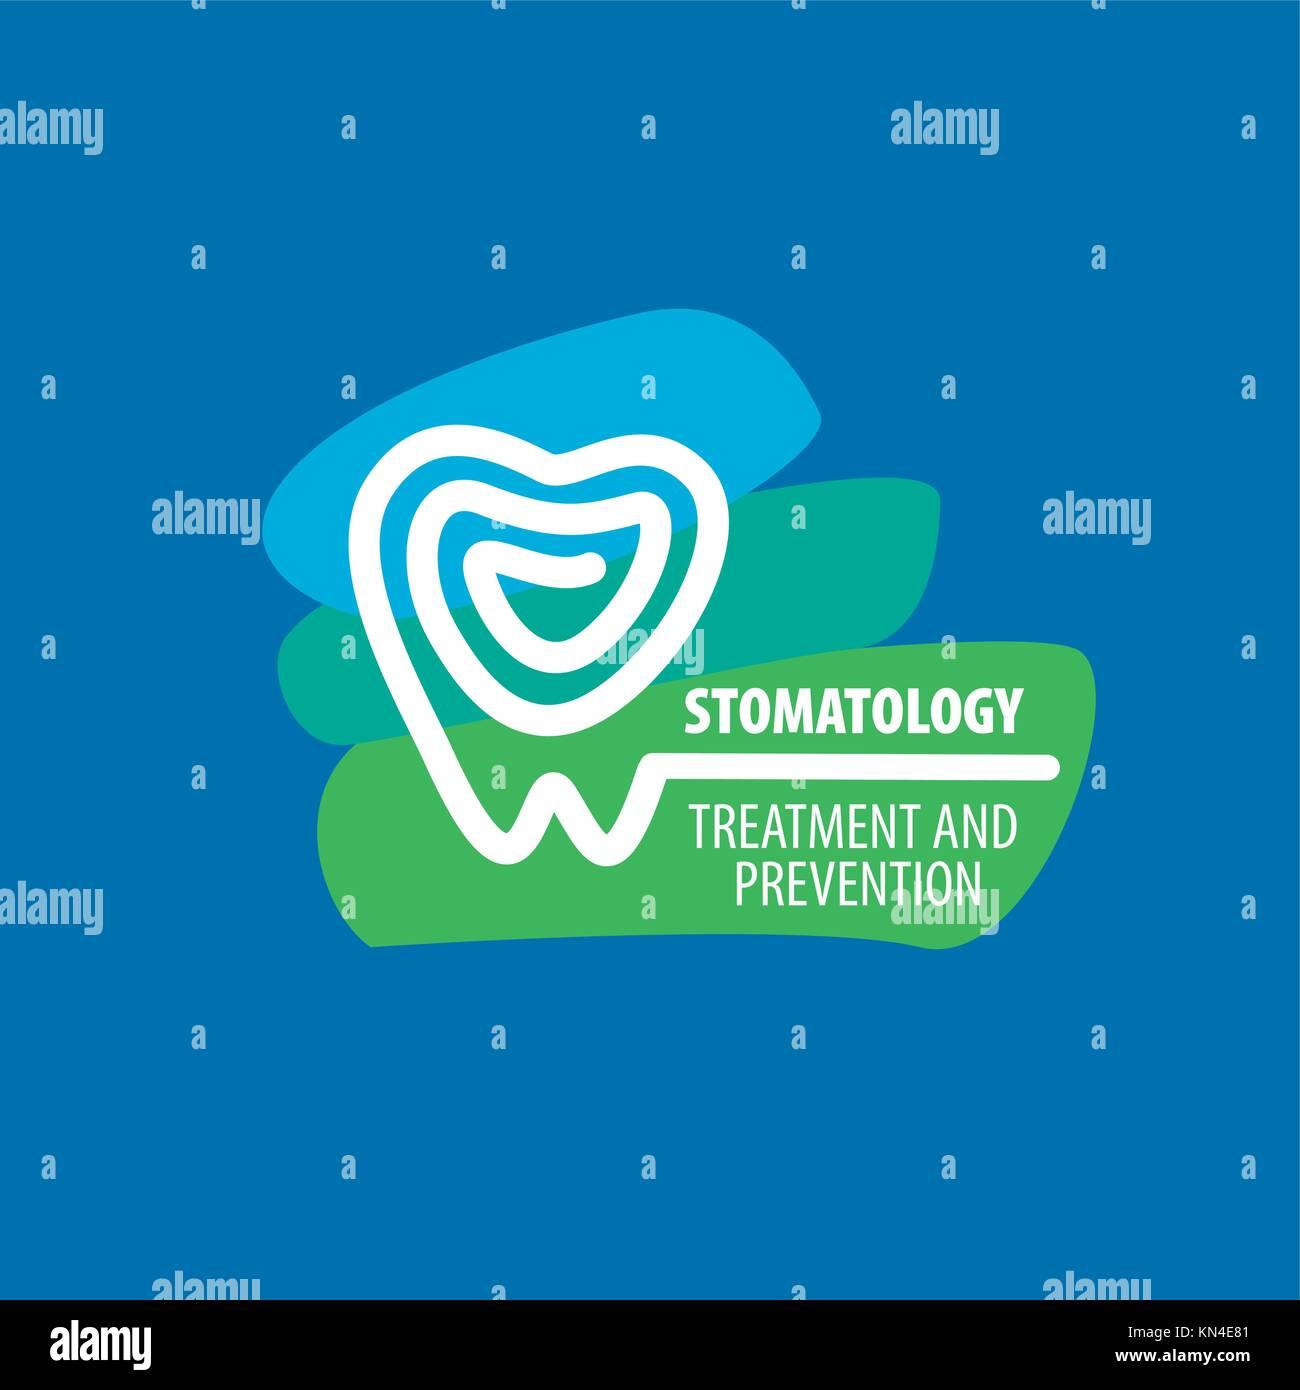 Dental Logo Template Imágenes De Stock & Dental Logo Template Fotos ...